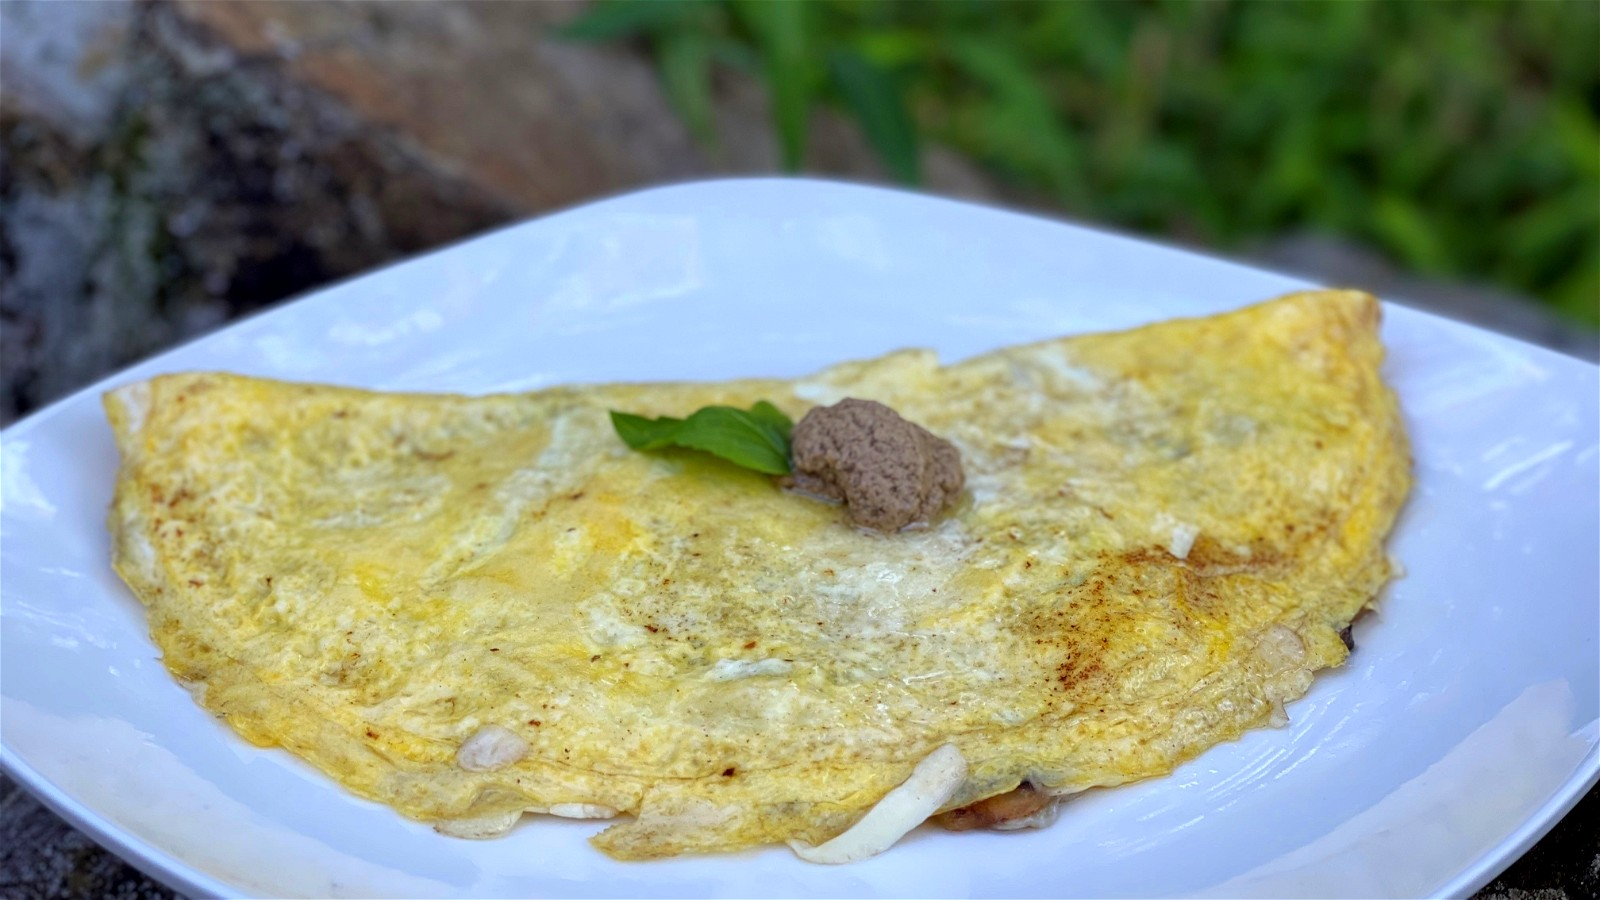 Image of Truffle Omelette